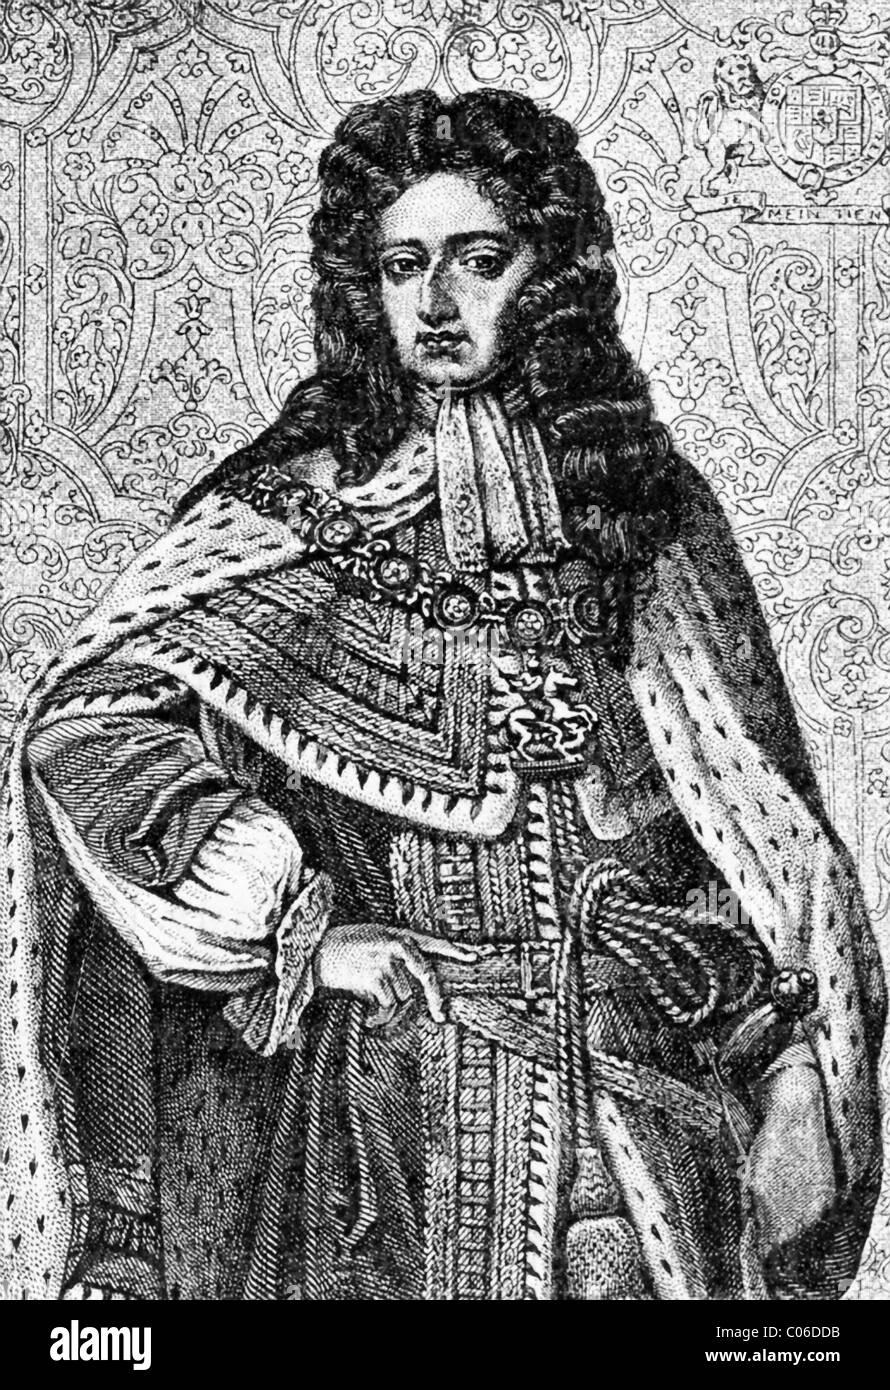 William III of England (1650-1702) was king of England, Scotland, and Ireland (1689-1702). - Stock Image